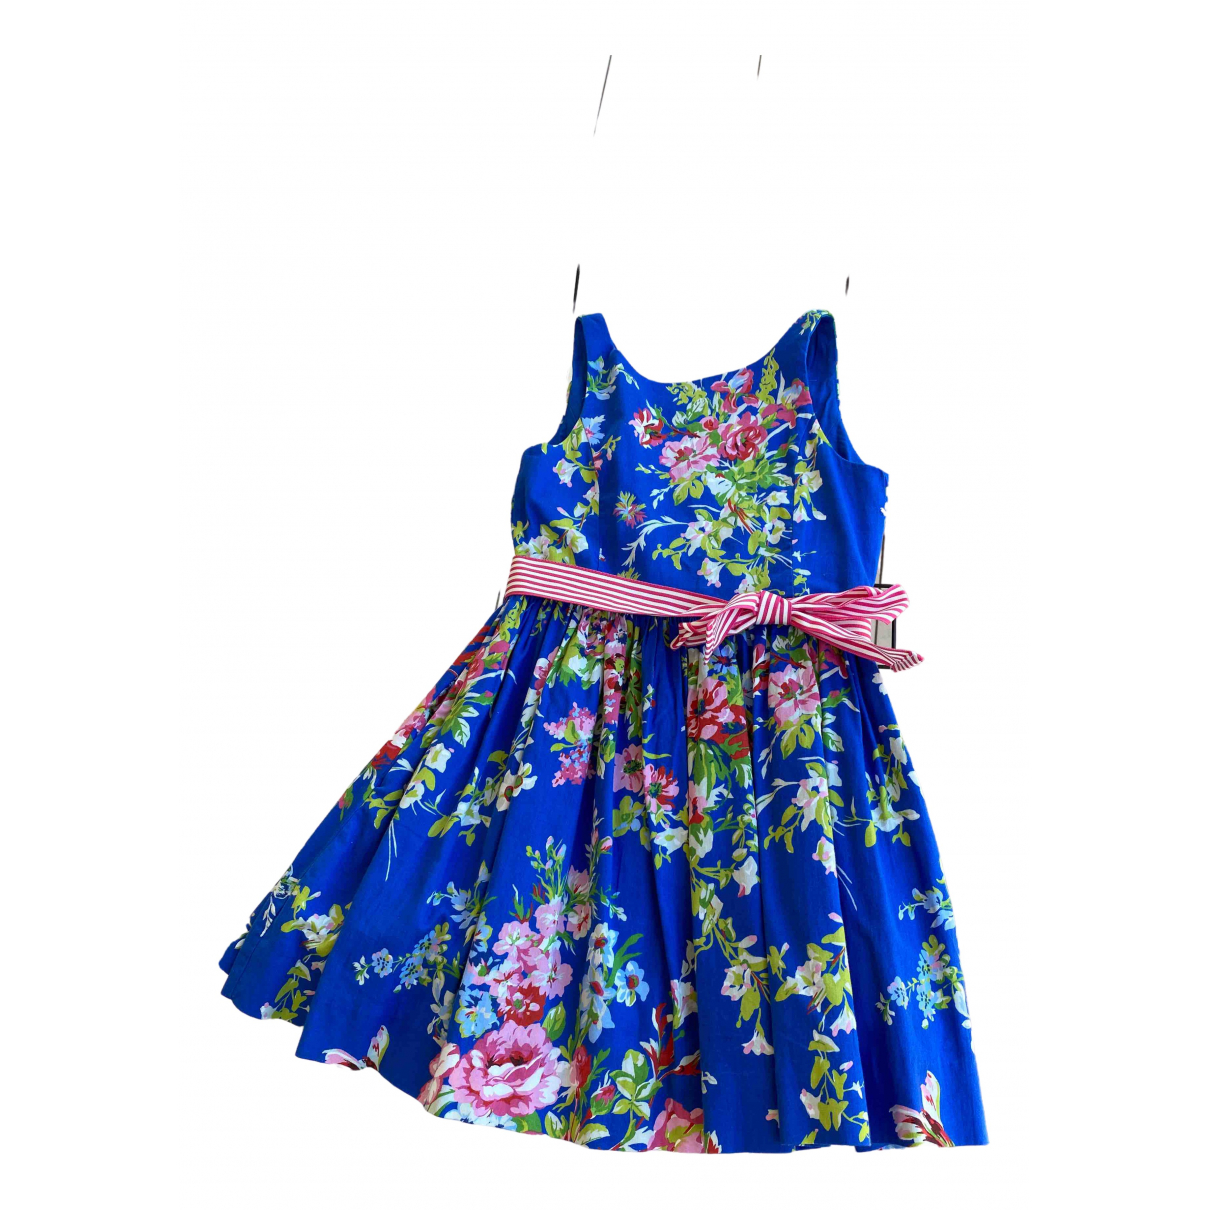 Polo Ralph Lauren \N Kleid in  Bunt Baumwolle